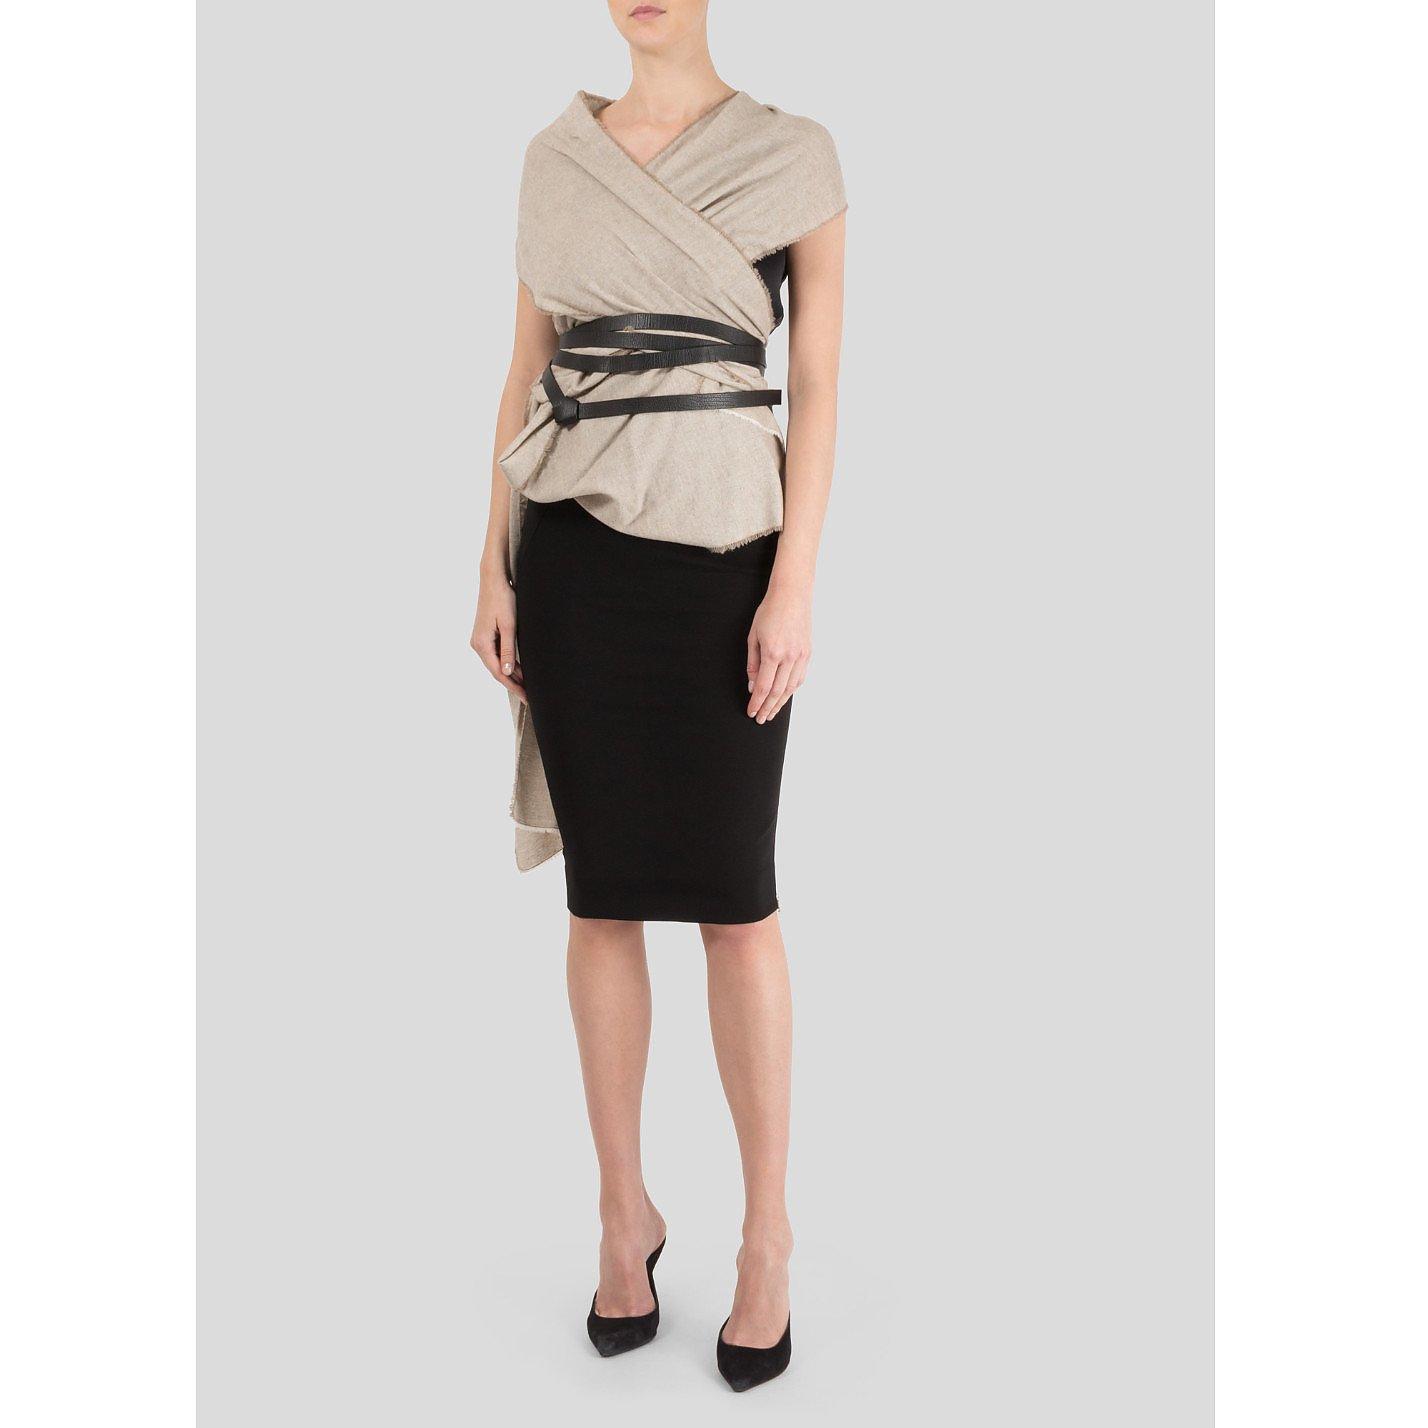 Victoria Beckham Cashmere Wrap Fitted Dress